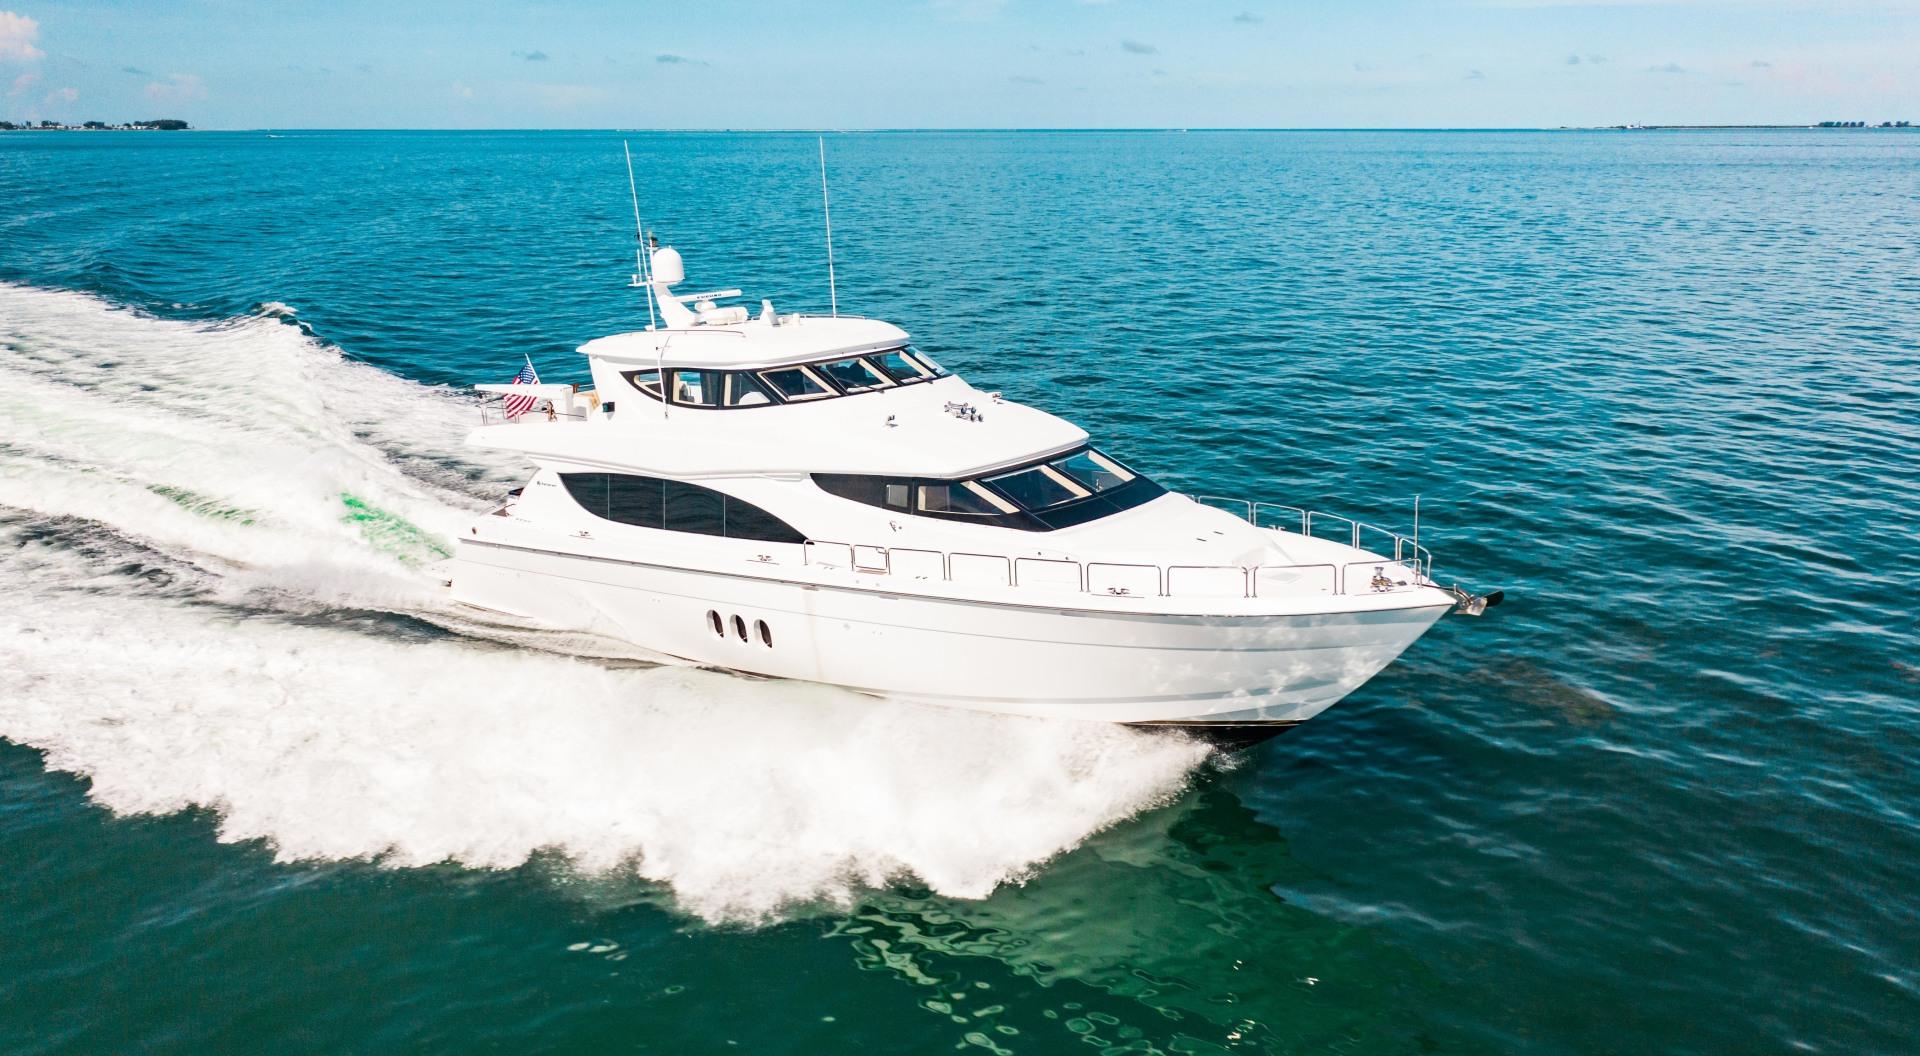 Hatteras-80 Motor Yacht 2008-Galati Yacht Sales Trade Anna Maria-Florida-United States-2008 Hatteras 80 Motor Yacht  Galati Yacht Sales Trade-1466270 | Thumbnail